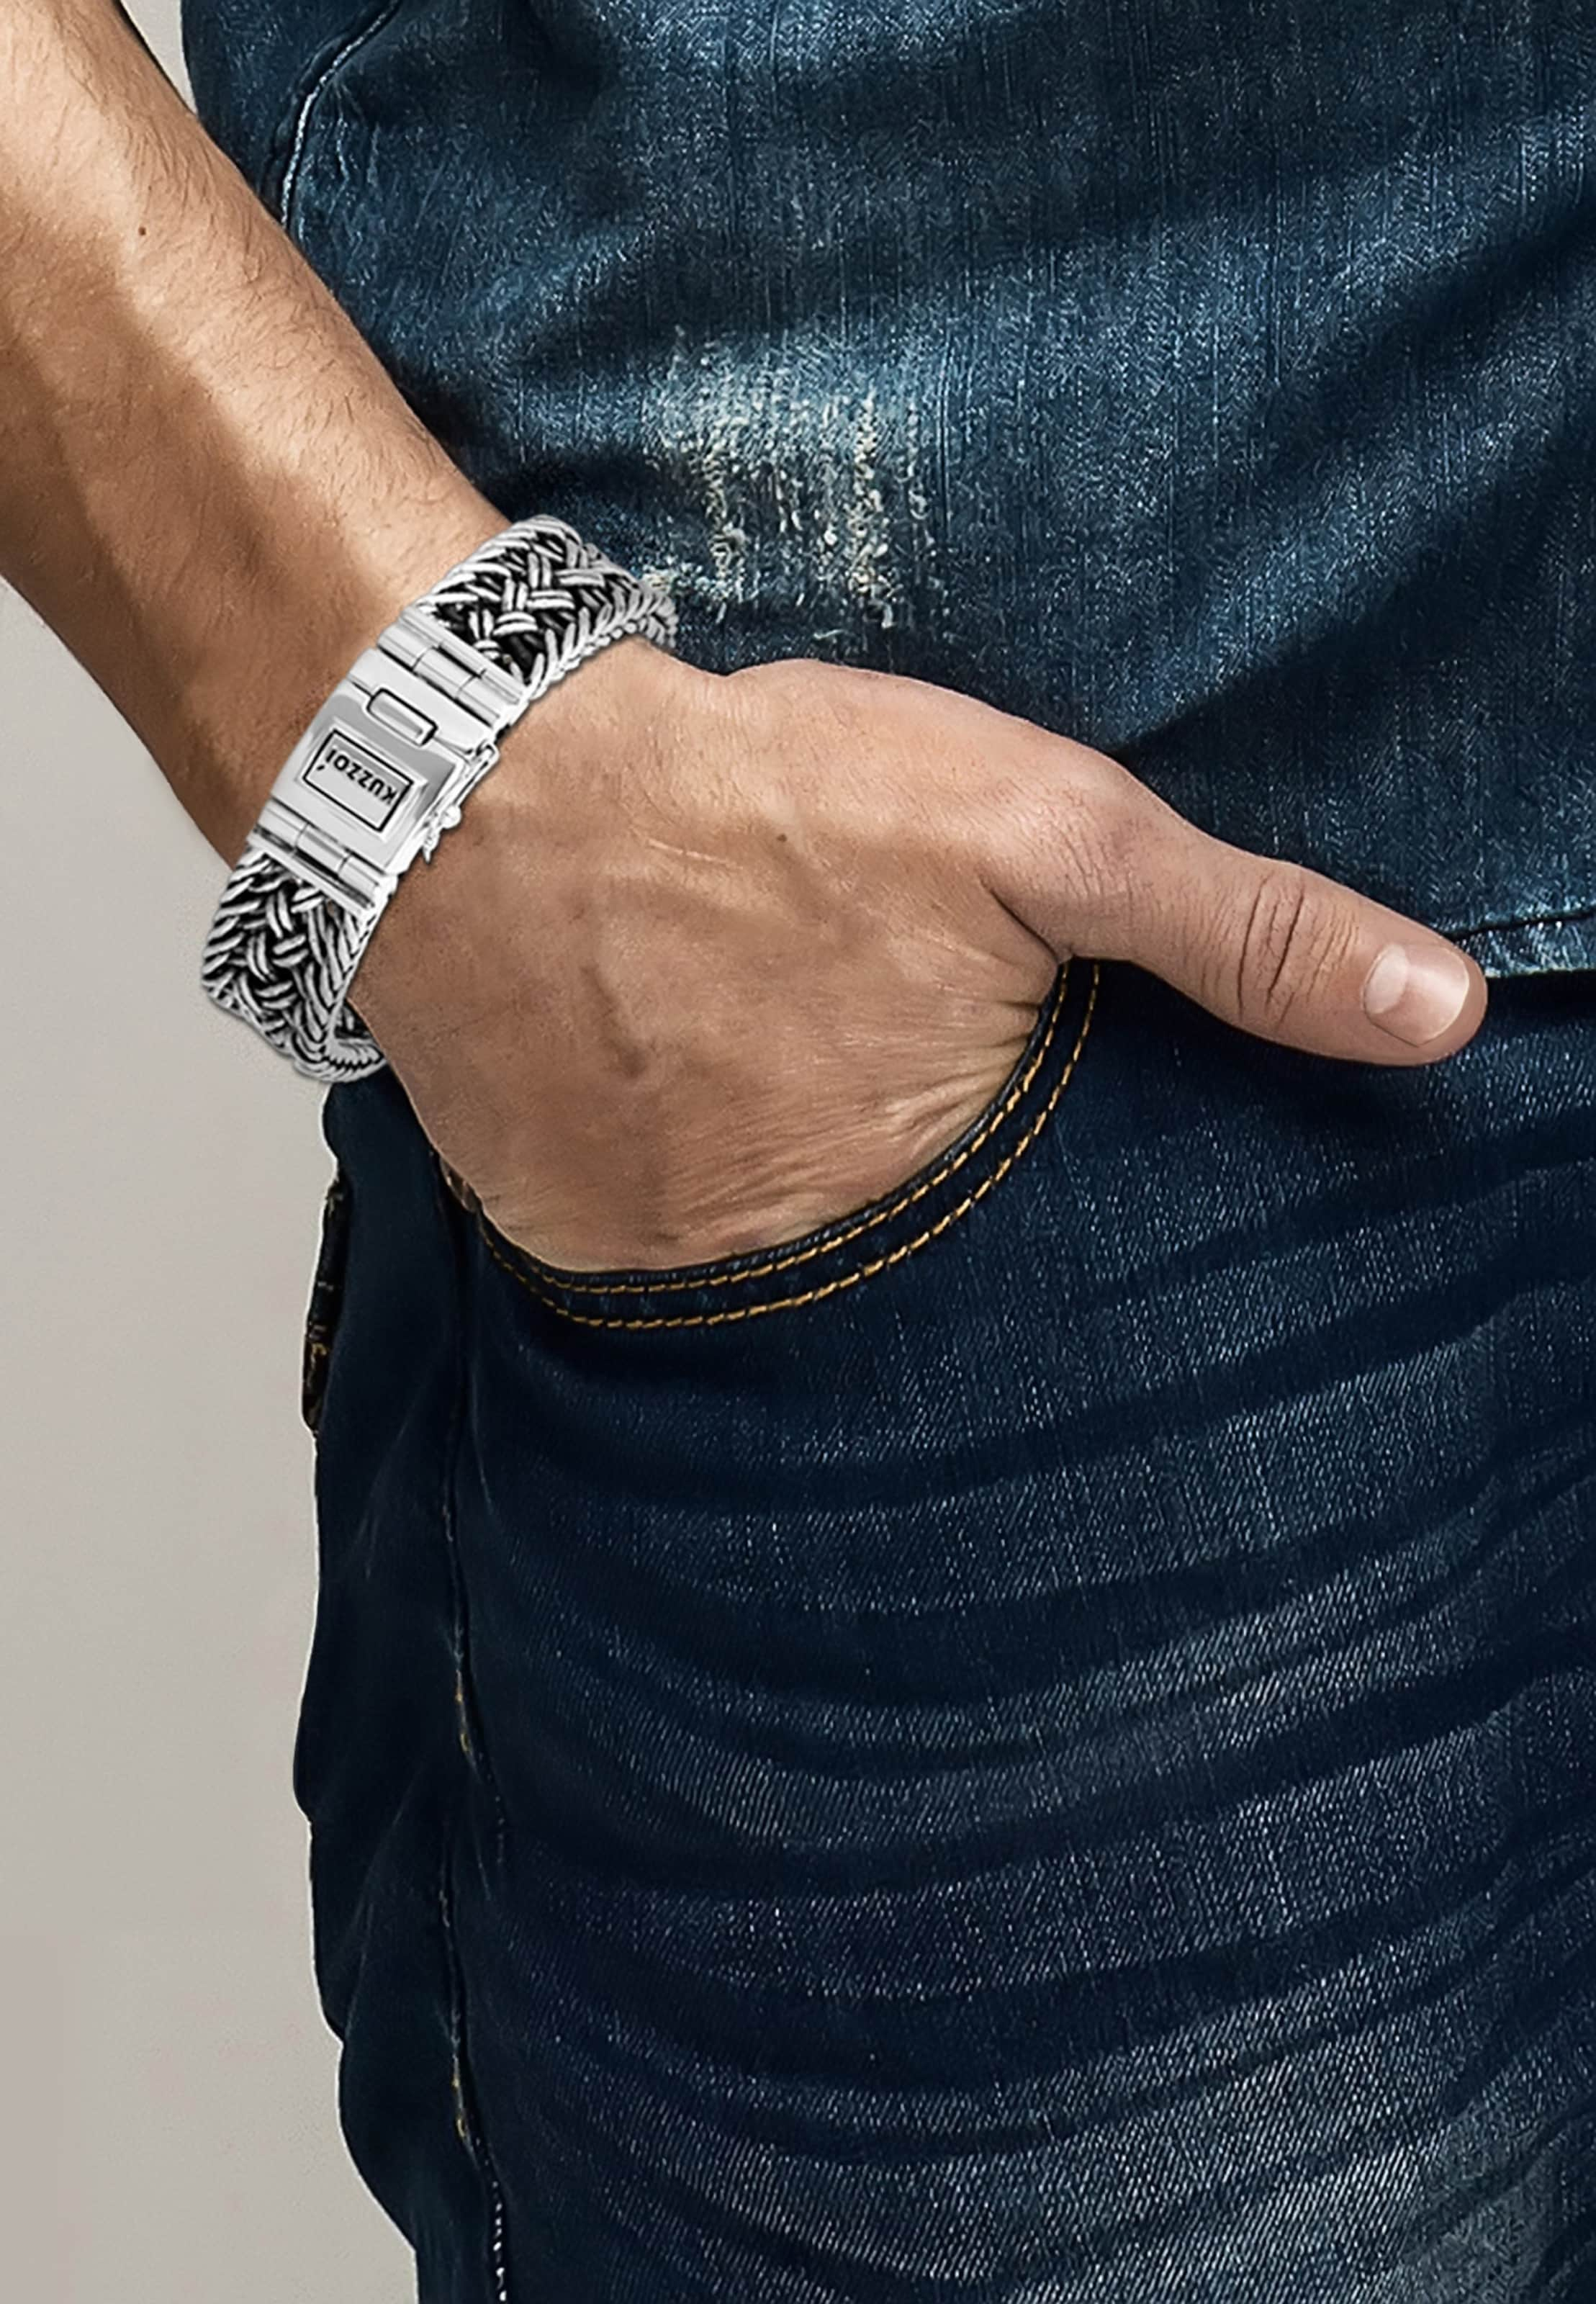 In Kuzzoi Armband Kuzzoi 'twisted' Silber 1FlKJc